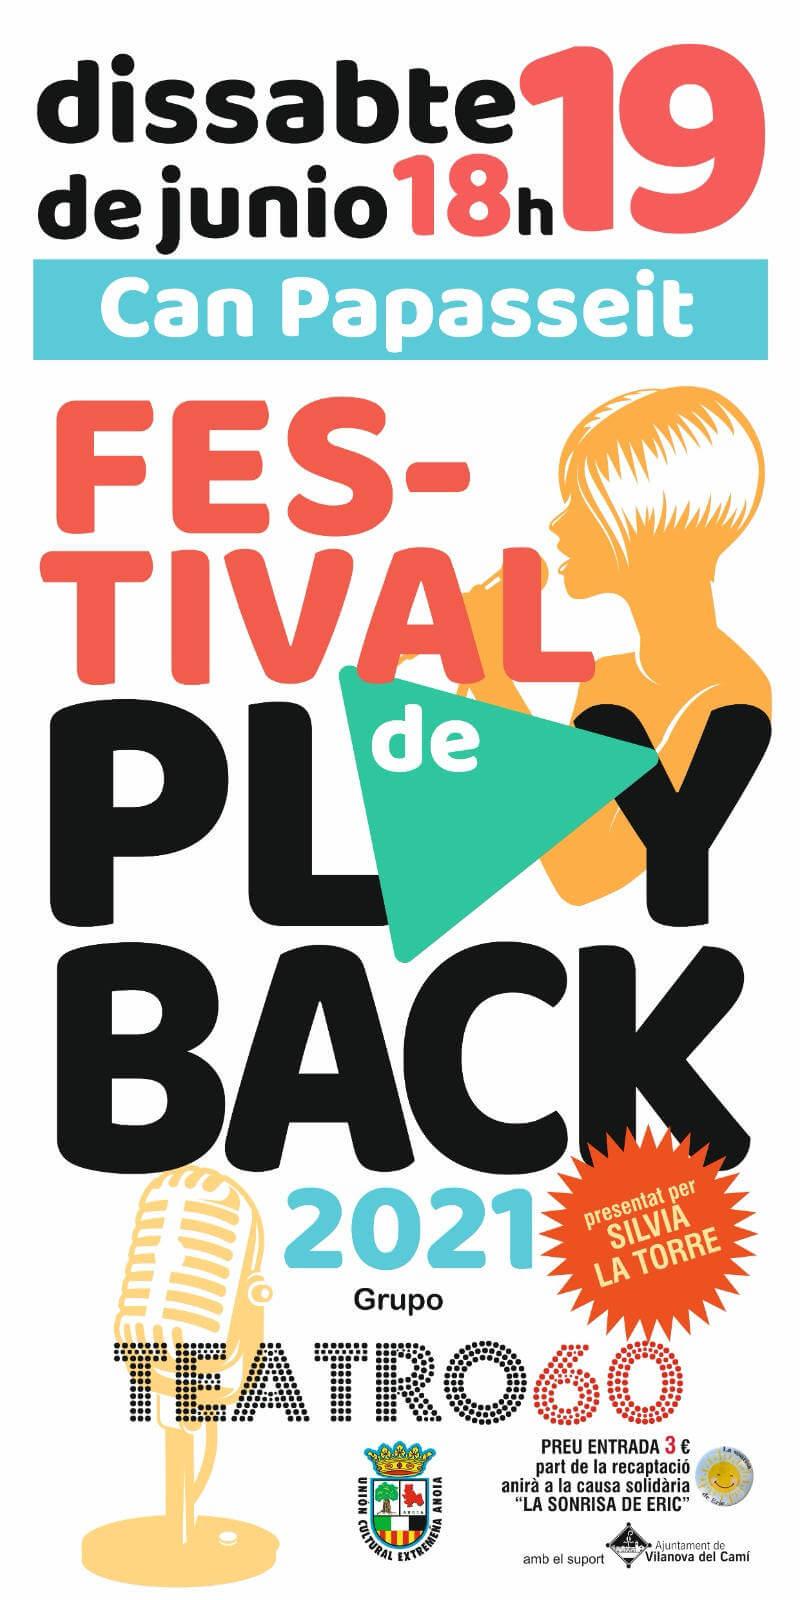 FESTIVAL DE PLAYBACK